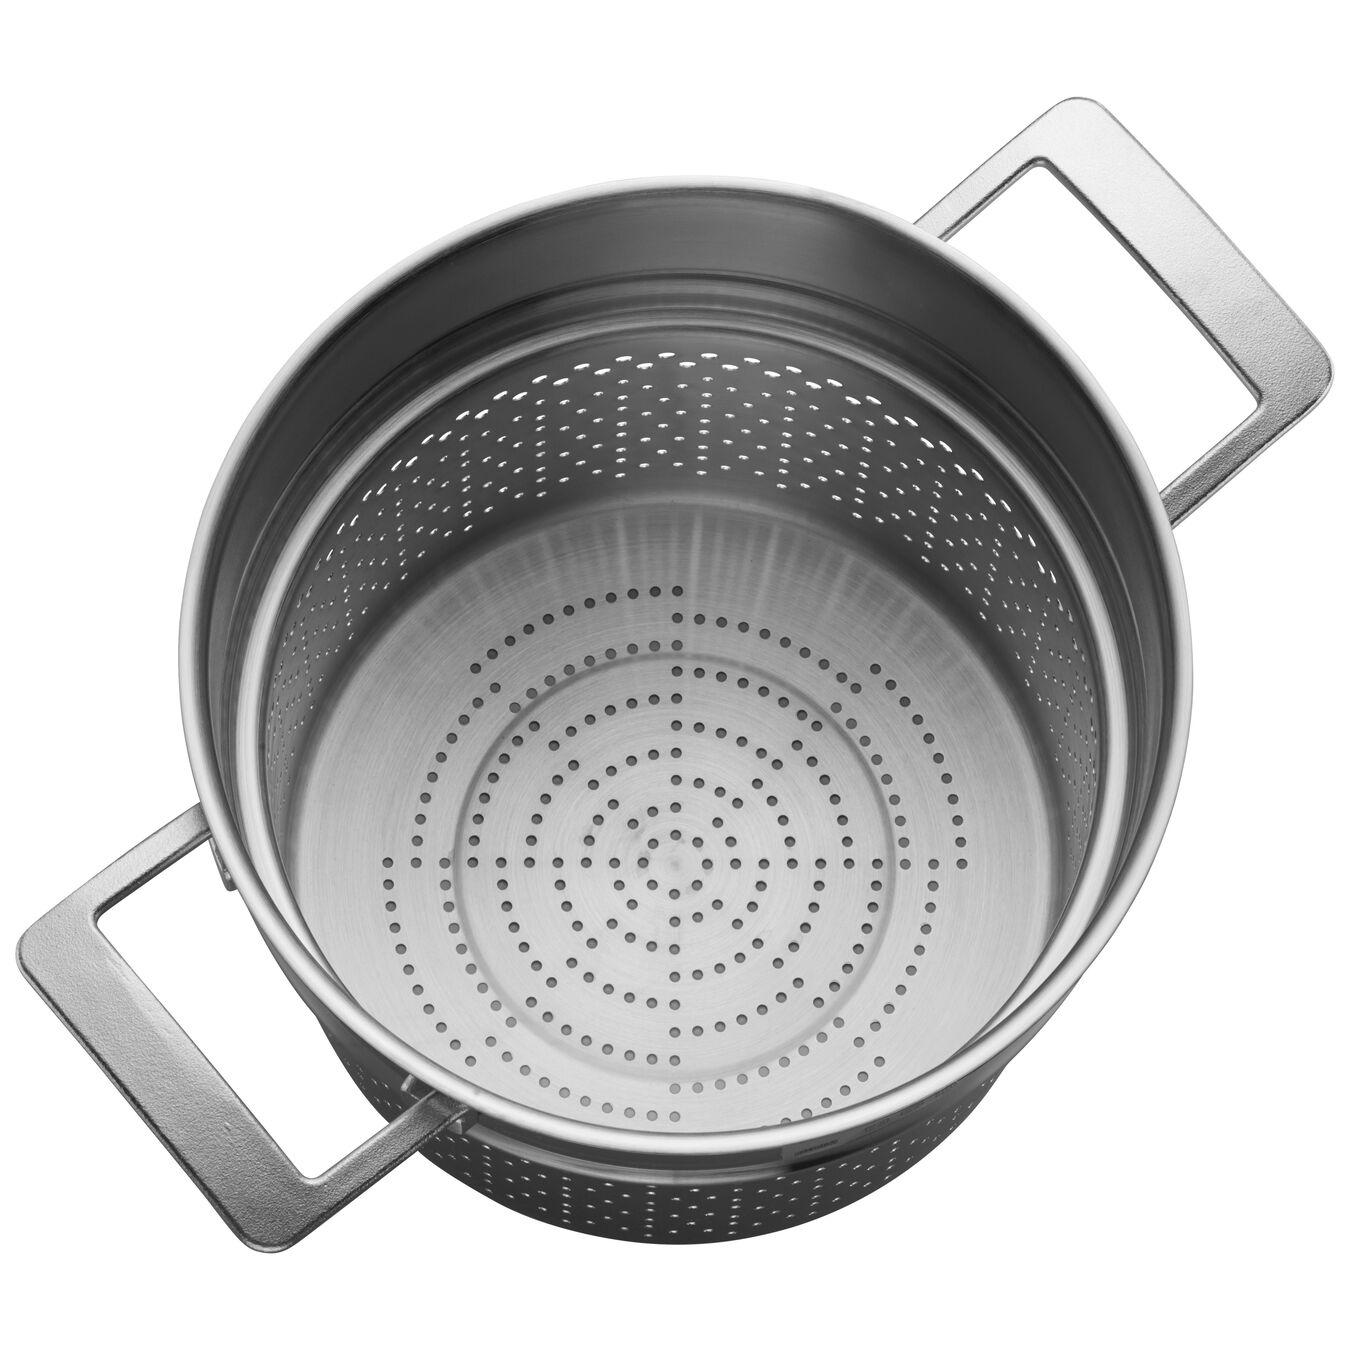 8-qt Stainless Steel Pasta Insert (Fits 8-qt Stock Pot),,large 2